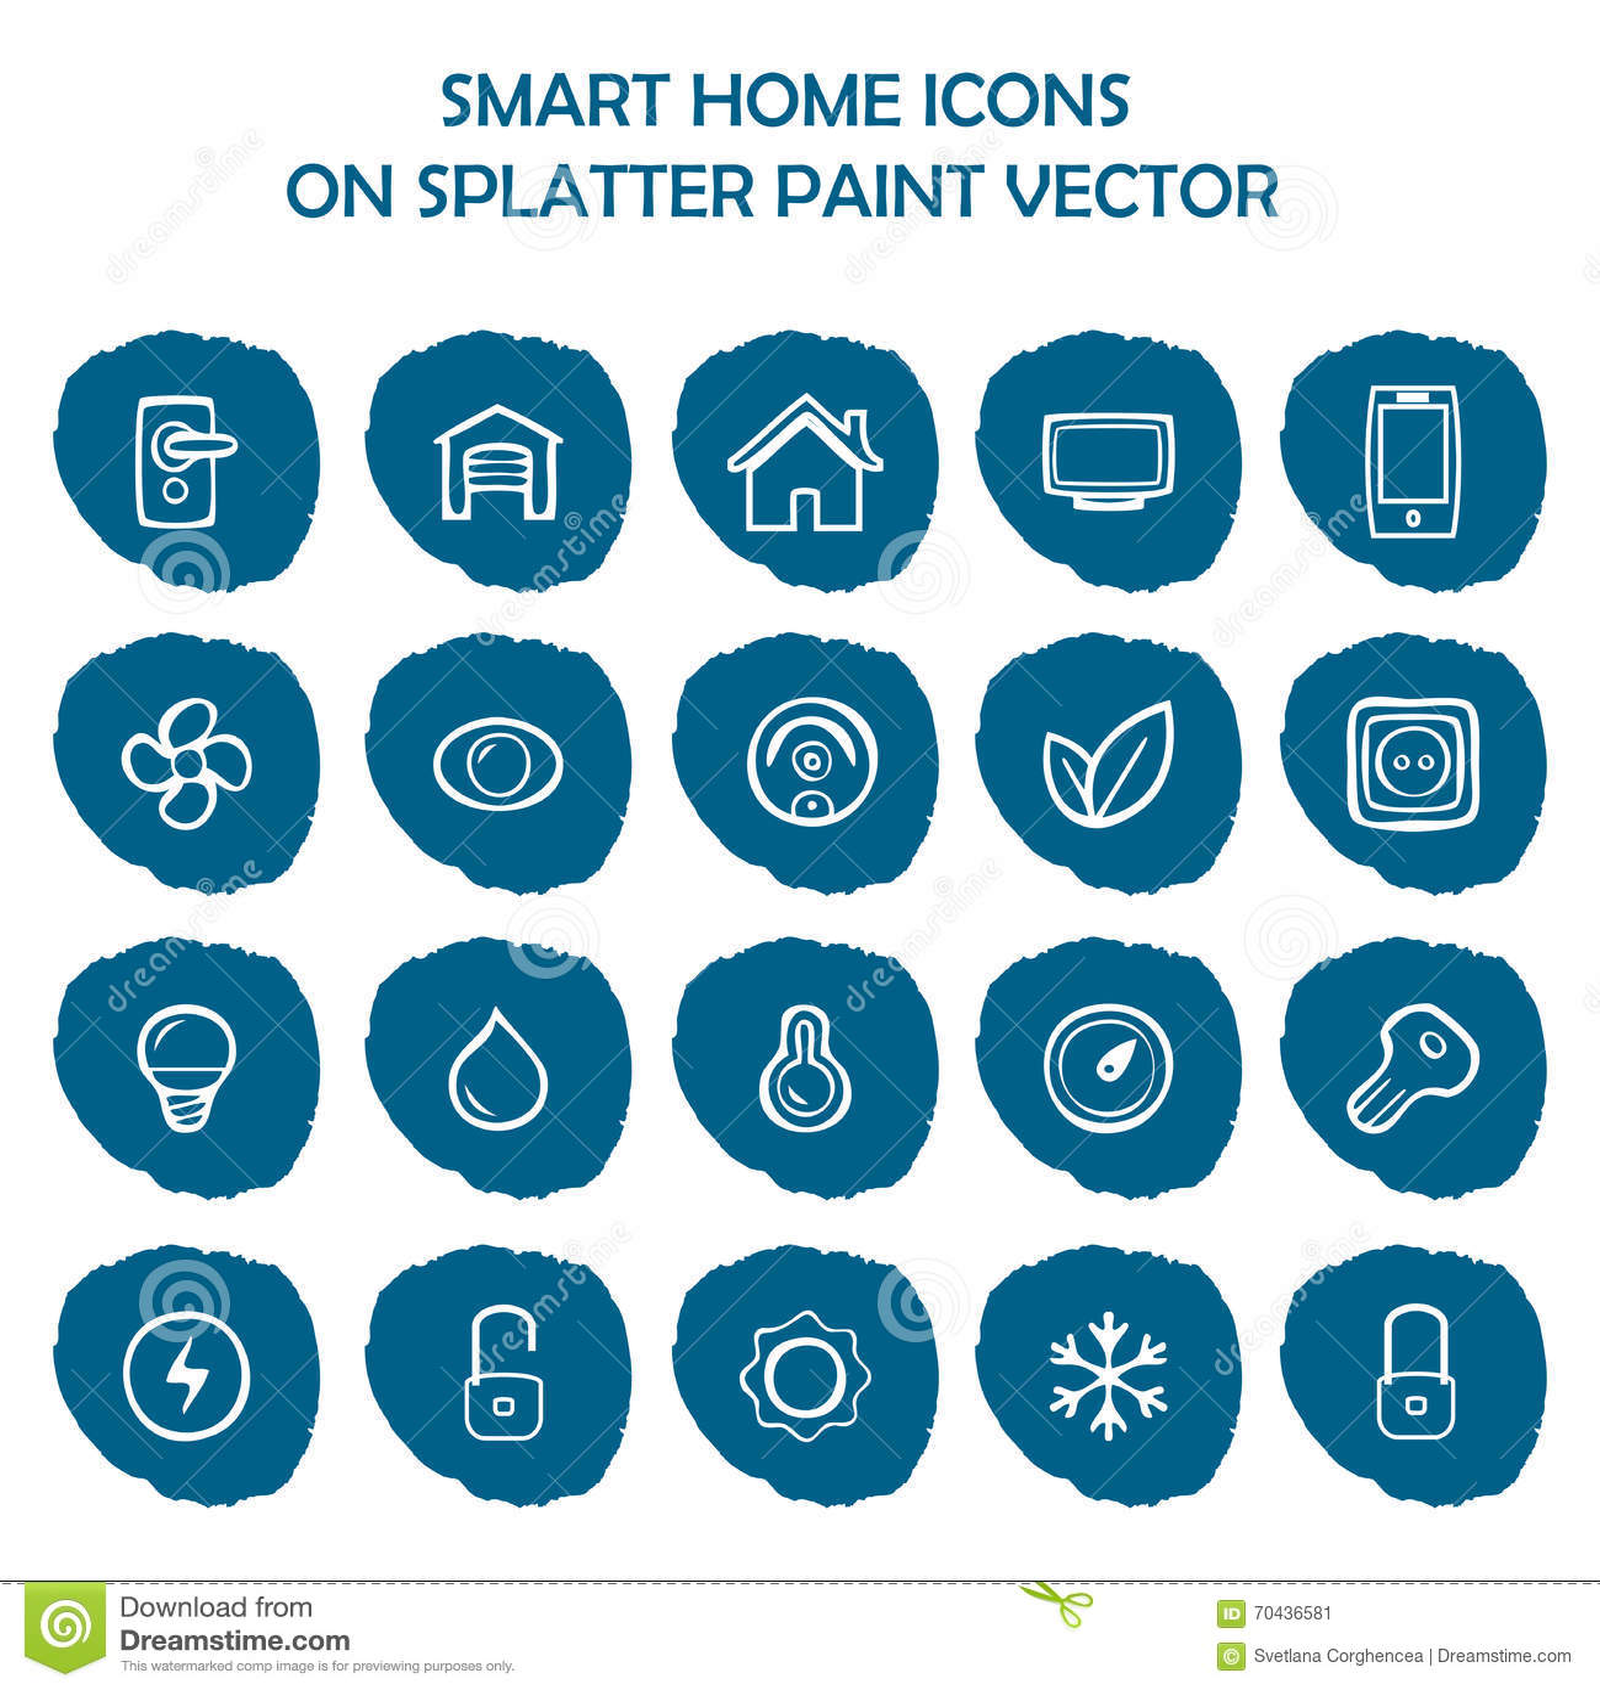 smart home icons on blue splatter paint flat icons stock vector image 70436581. Black Bedroom Furniture Sets. Home Design Ideas